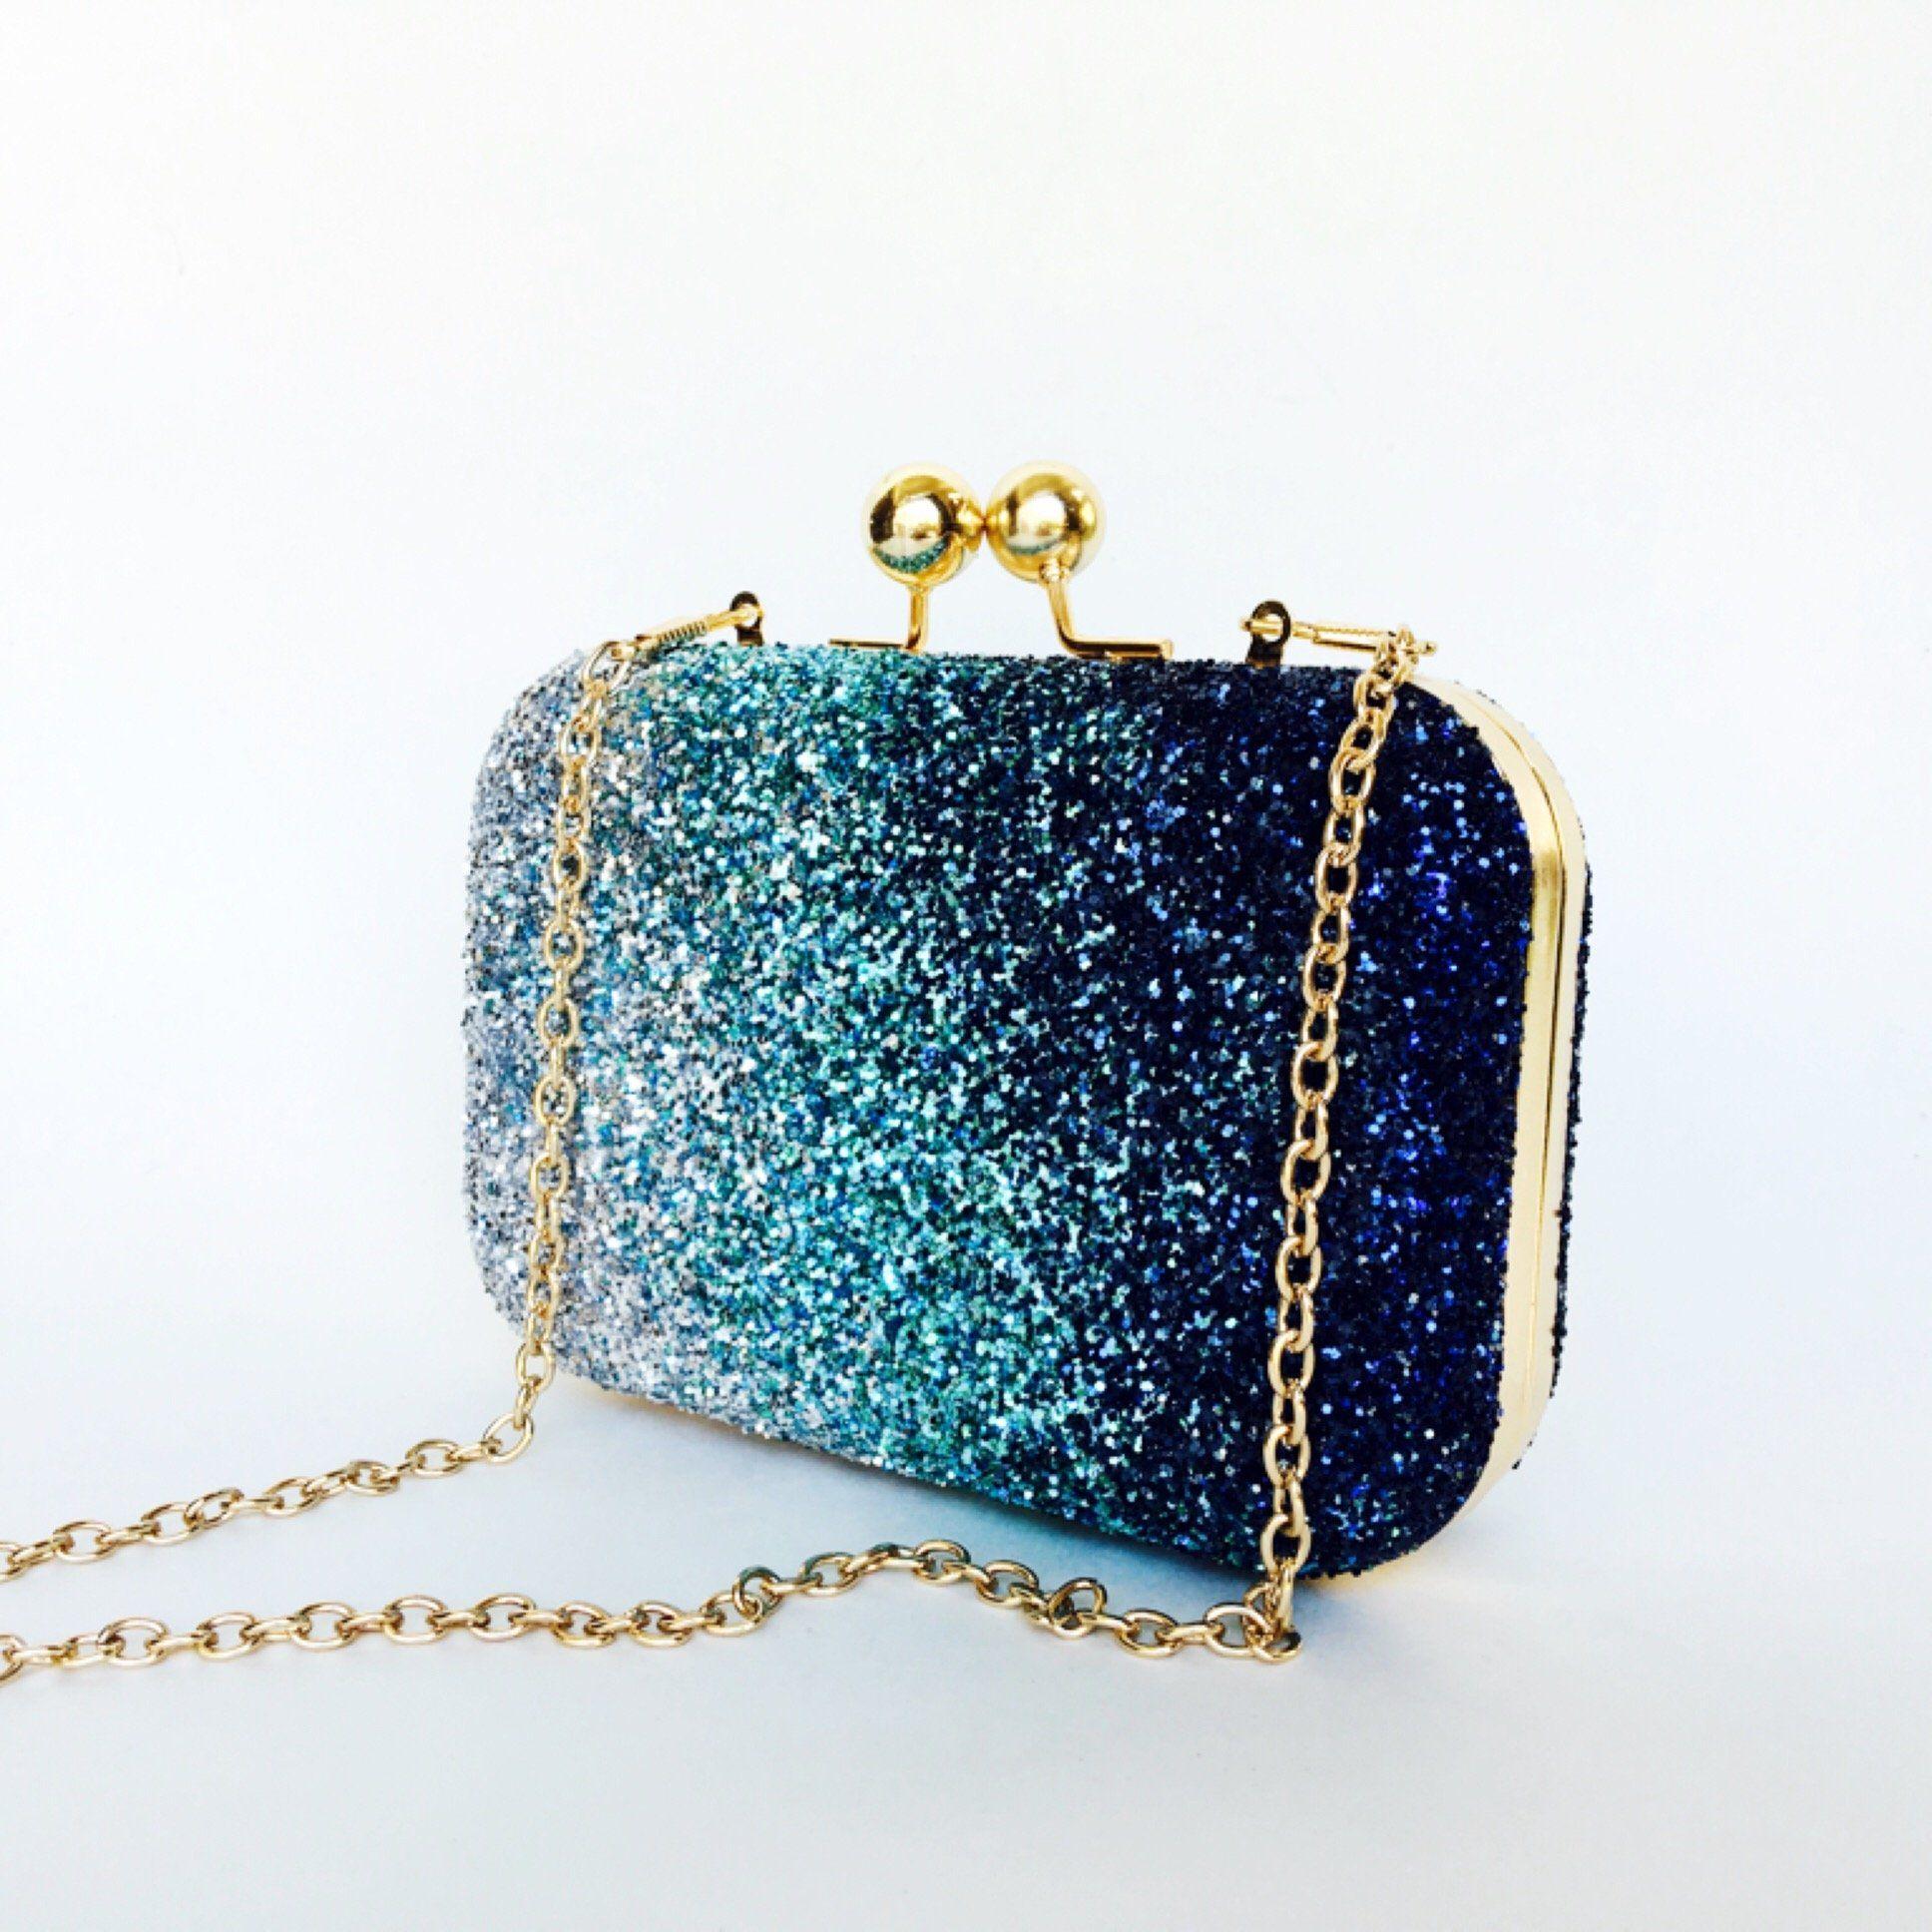 Vintage Women Sequins Dazzling Glitter Hard Case Clutch Evening Party HandBag